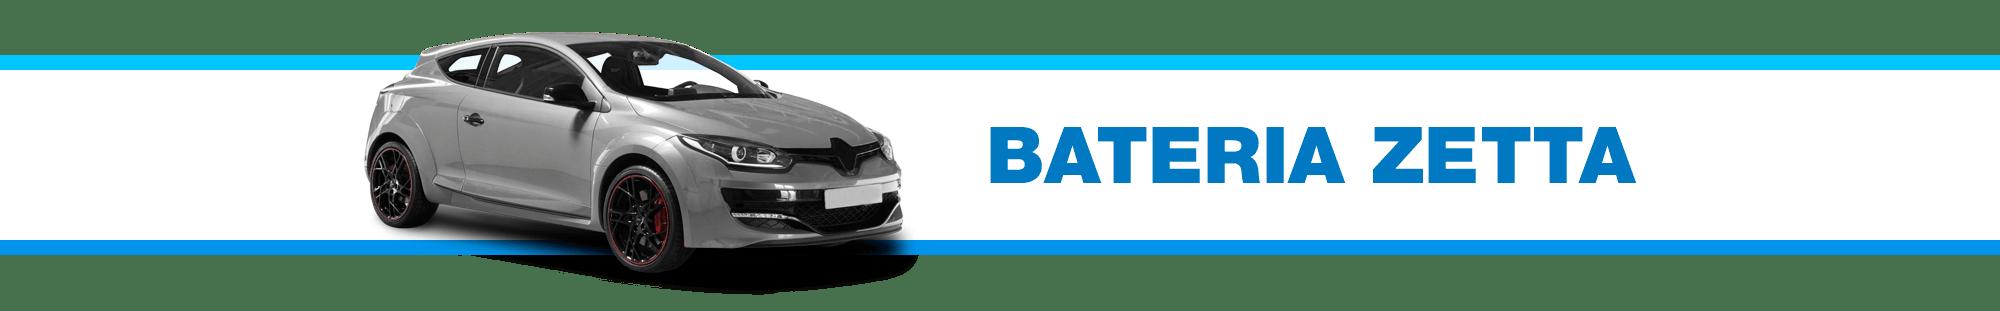 sv-baterias-bateria-zetta-carro